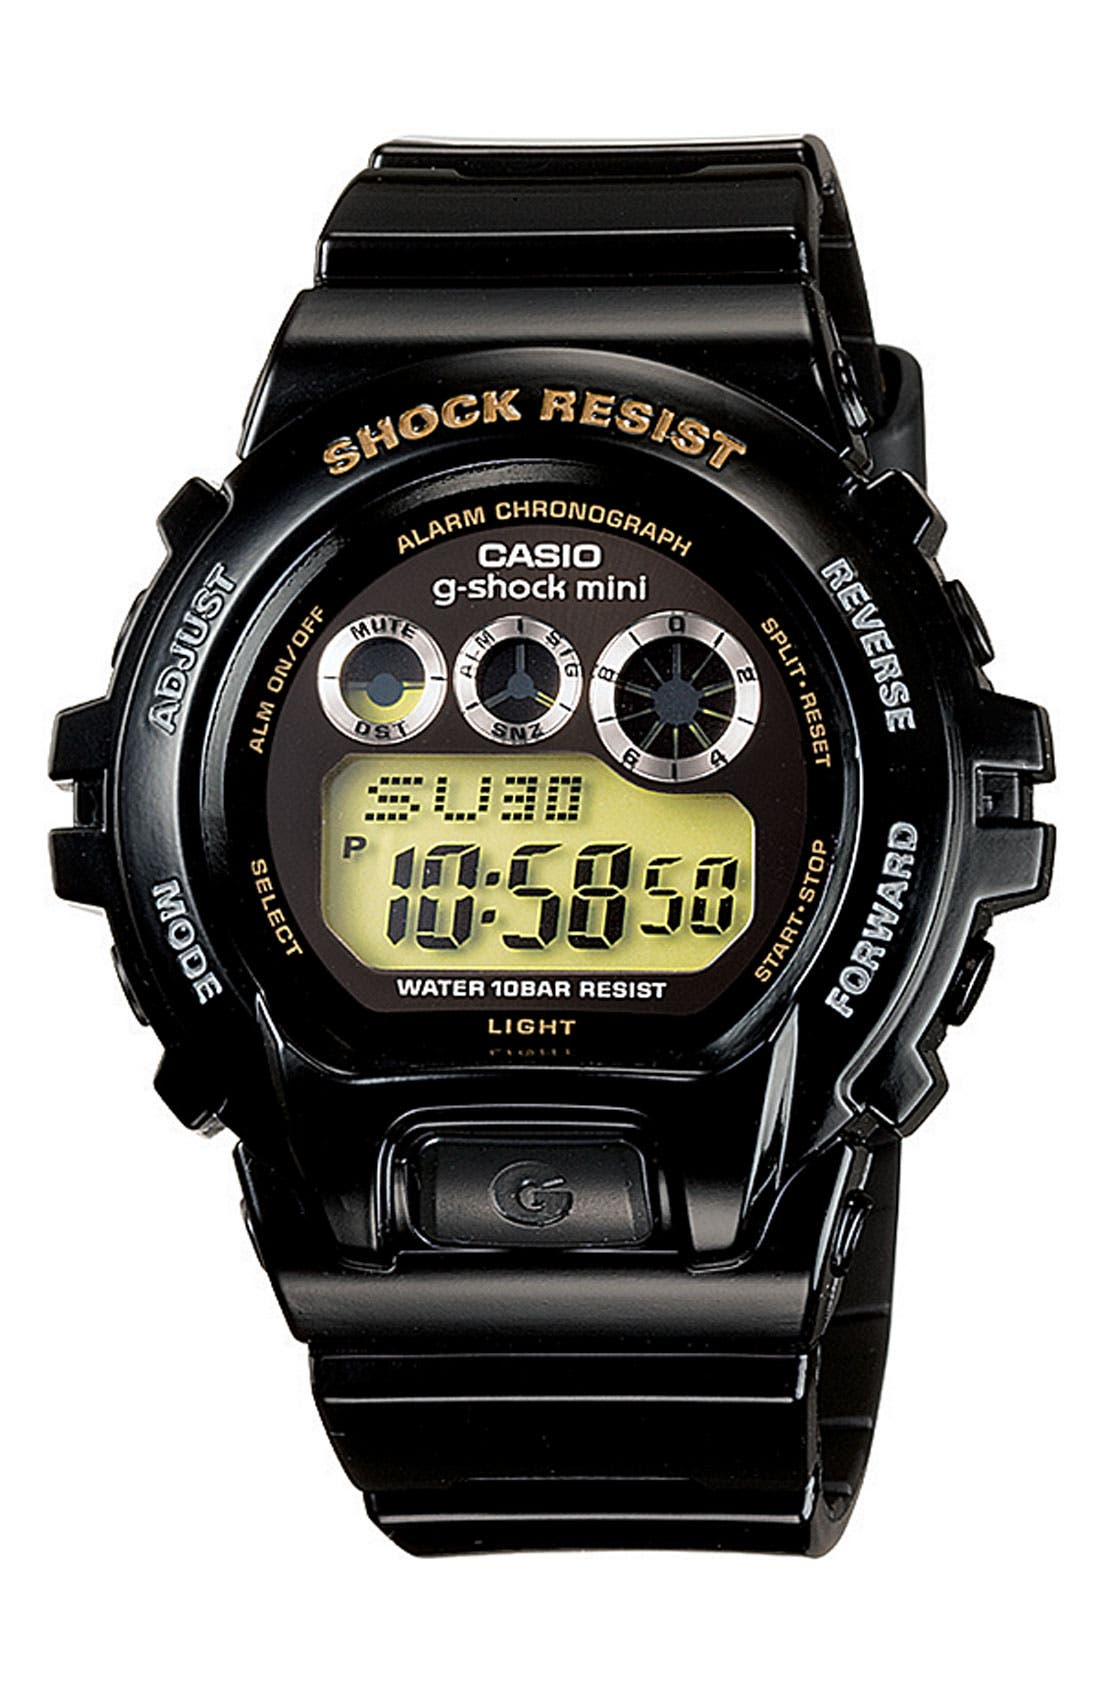 G-SHOCK BABY-G Casio 'G-Shock Mini' Watch, Main, color, 001